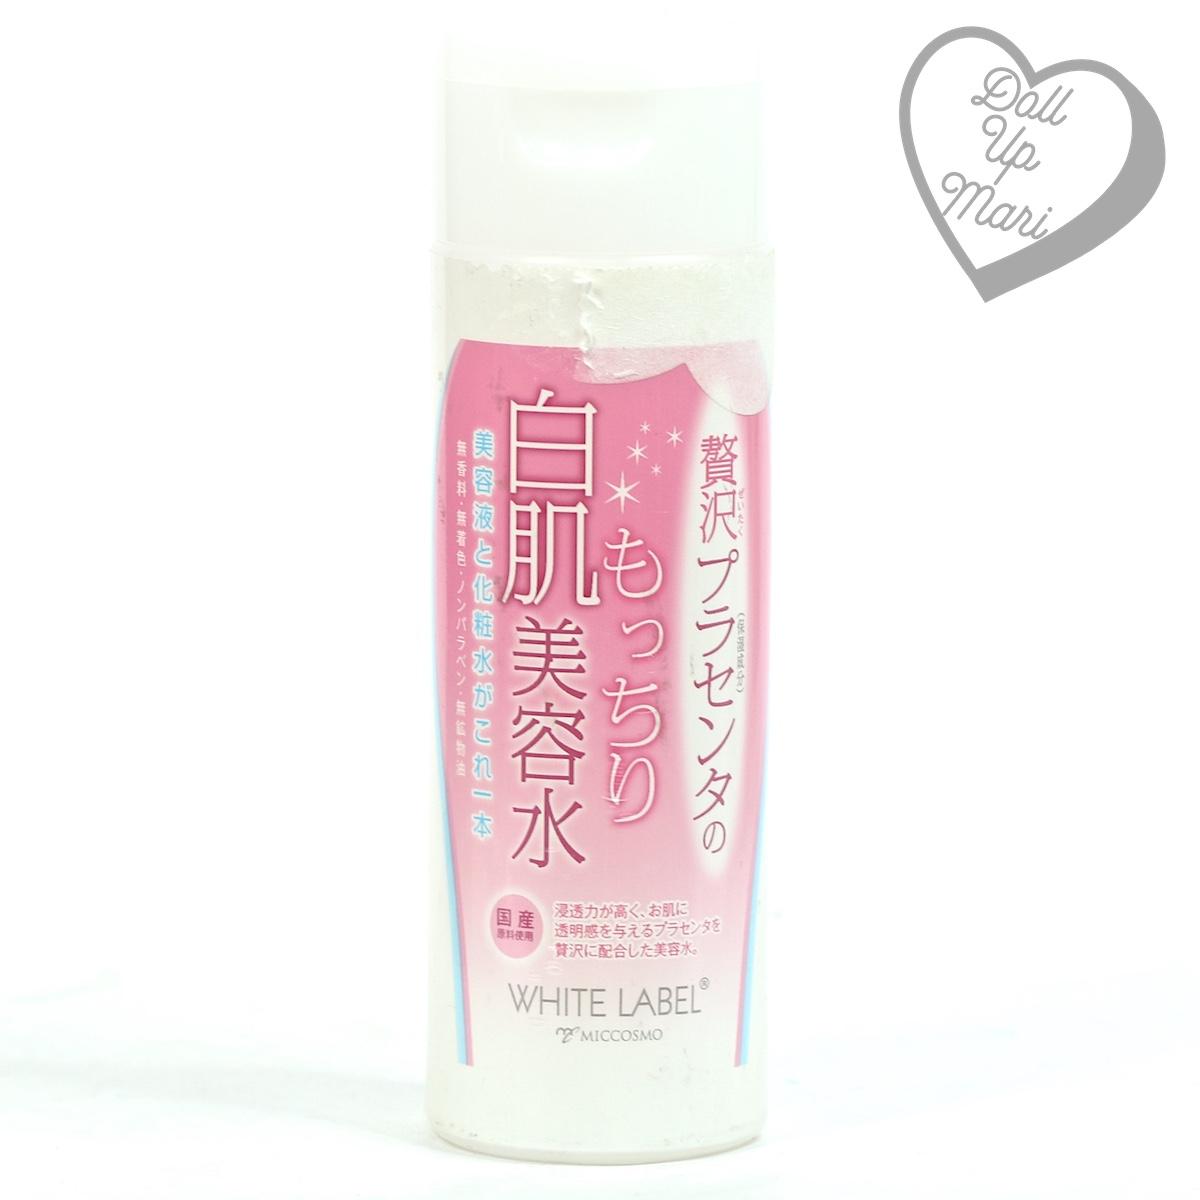 Pack shot of Miccosmo White Label Premium Placenta Essence